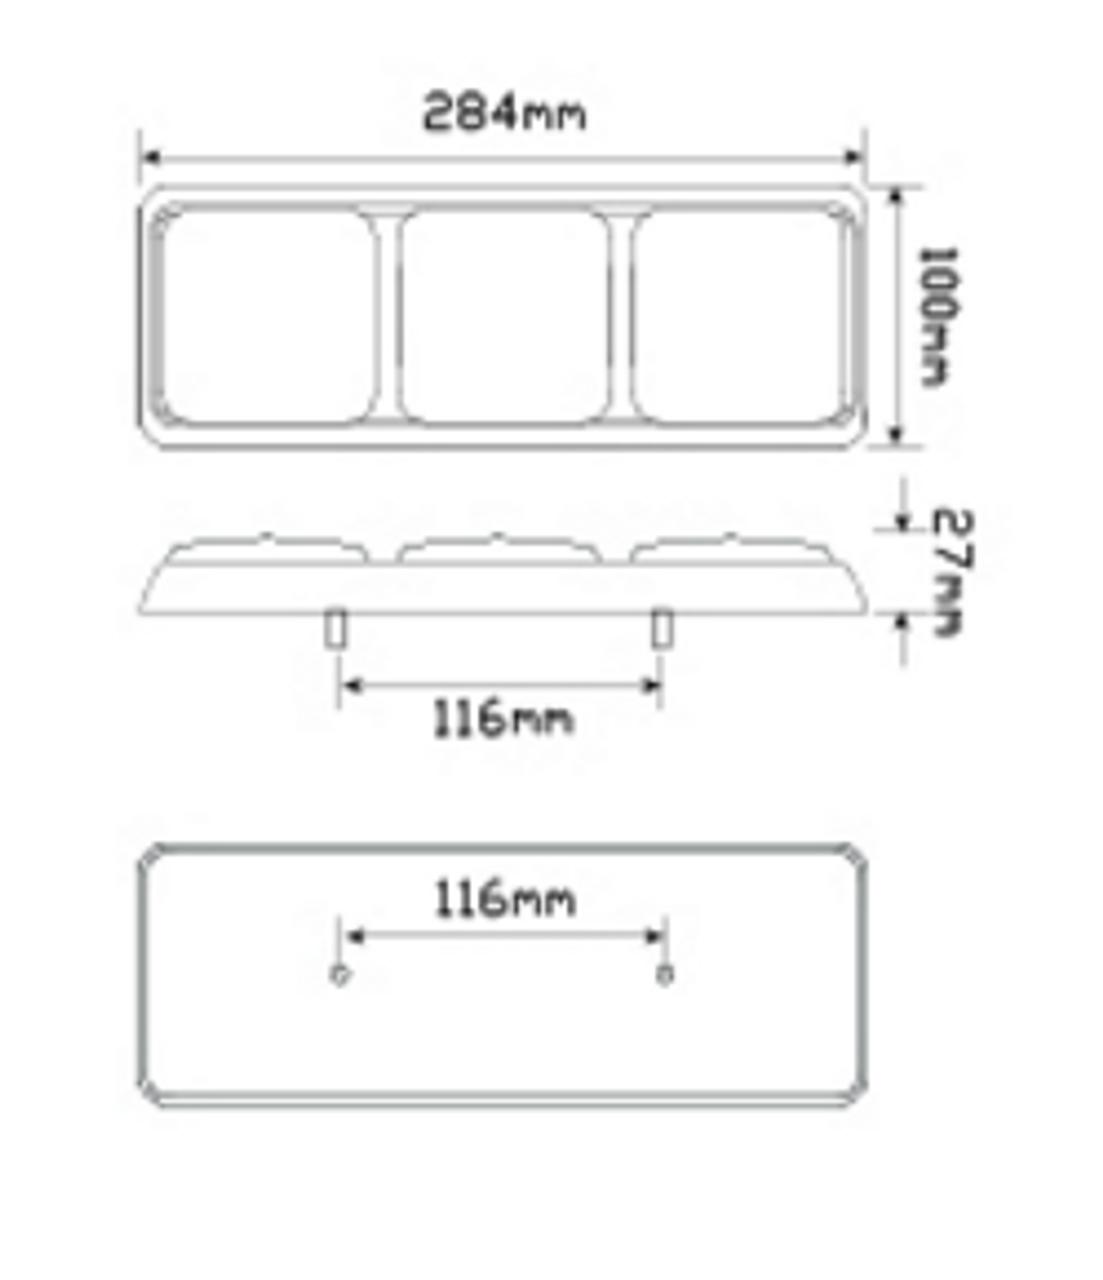 Line Drawing - 282ARWM - Combination Tail Light Triple Light. Stop, Tail, Indicator & Reverse Light. Multi-Volt 12v & 24v Blister Single Pack. LED Auto Lamps. Ultimate LED.